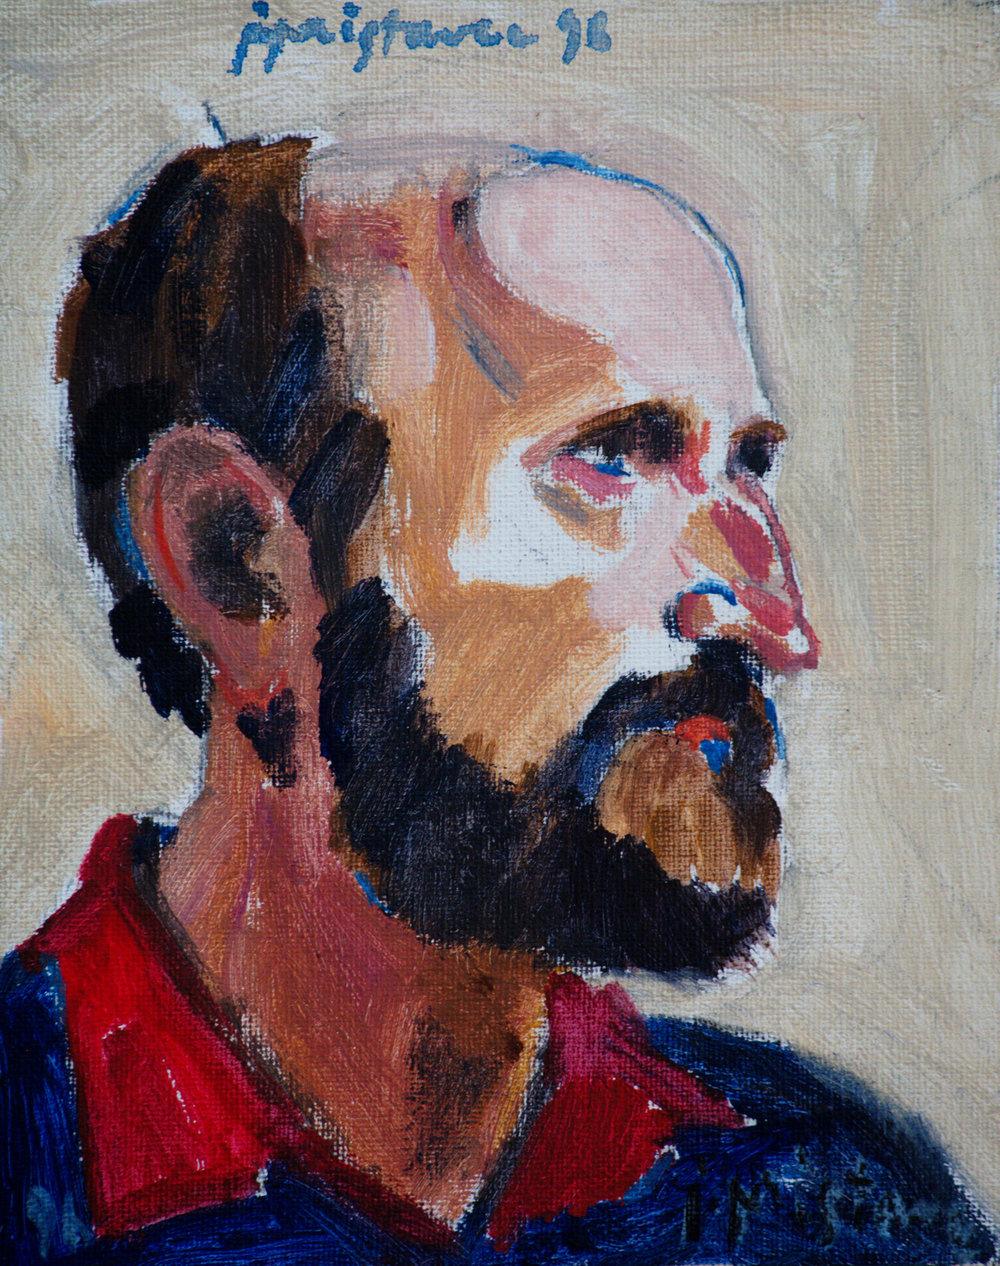 1996_portrait_20x25cm_Portrait_of_sculptor_MD.jpg